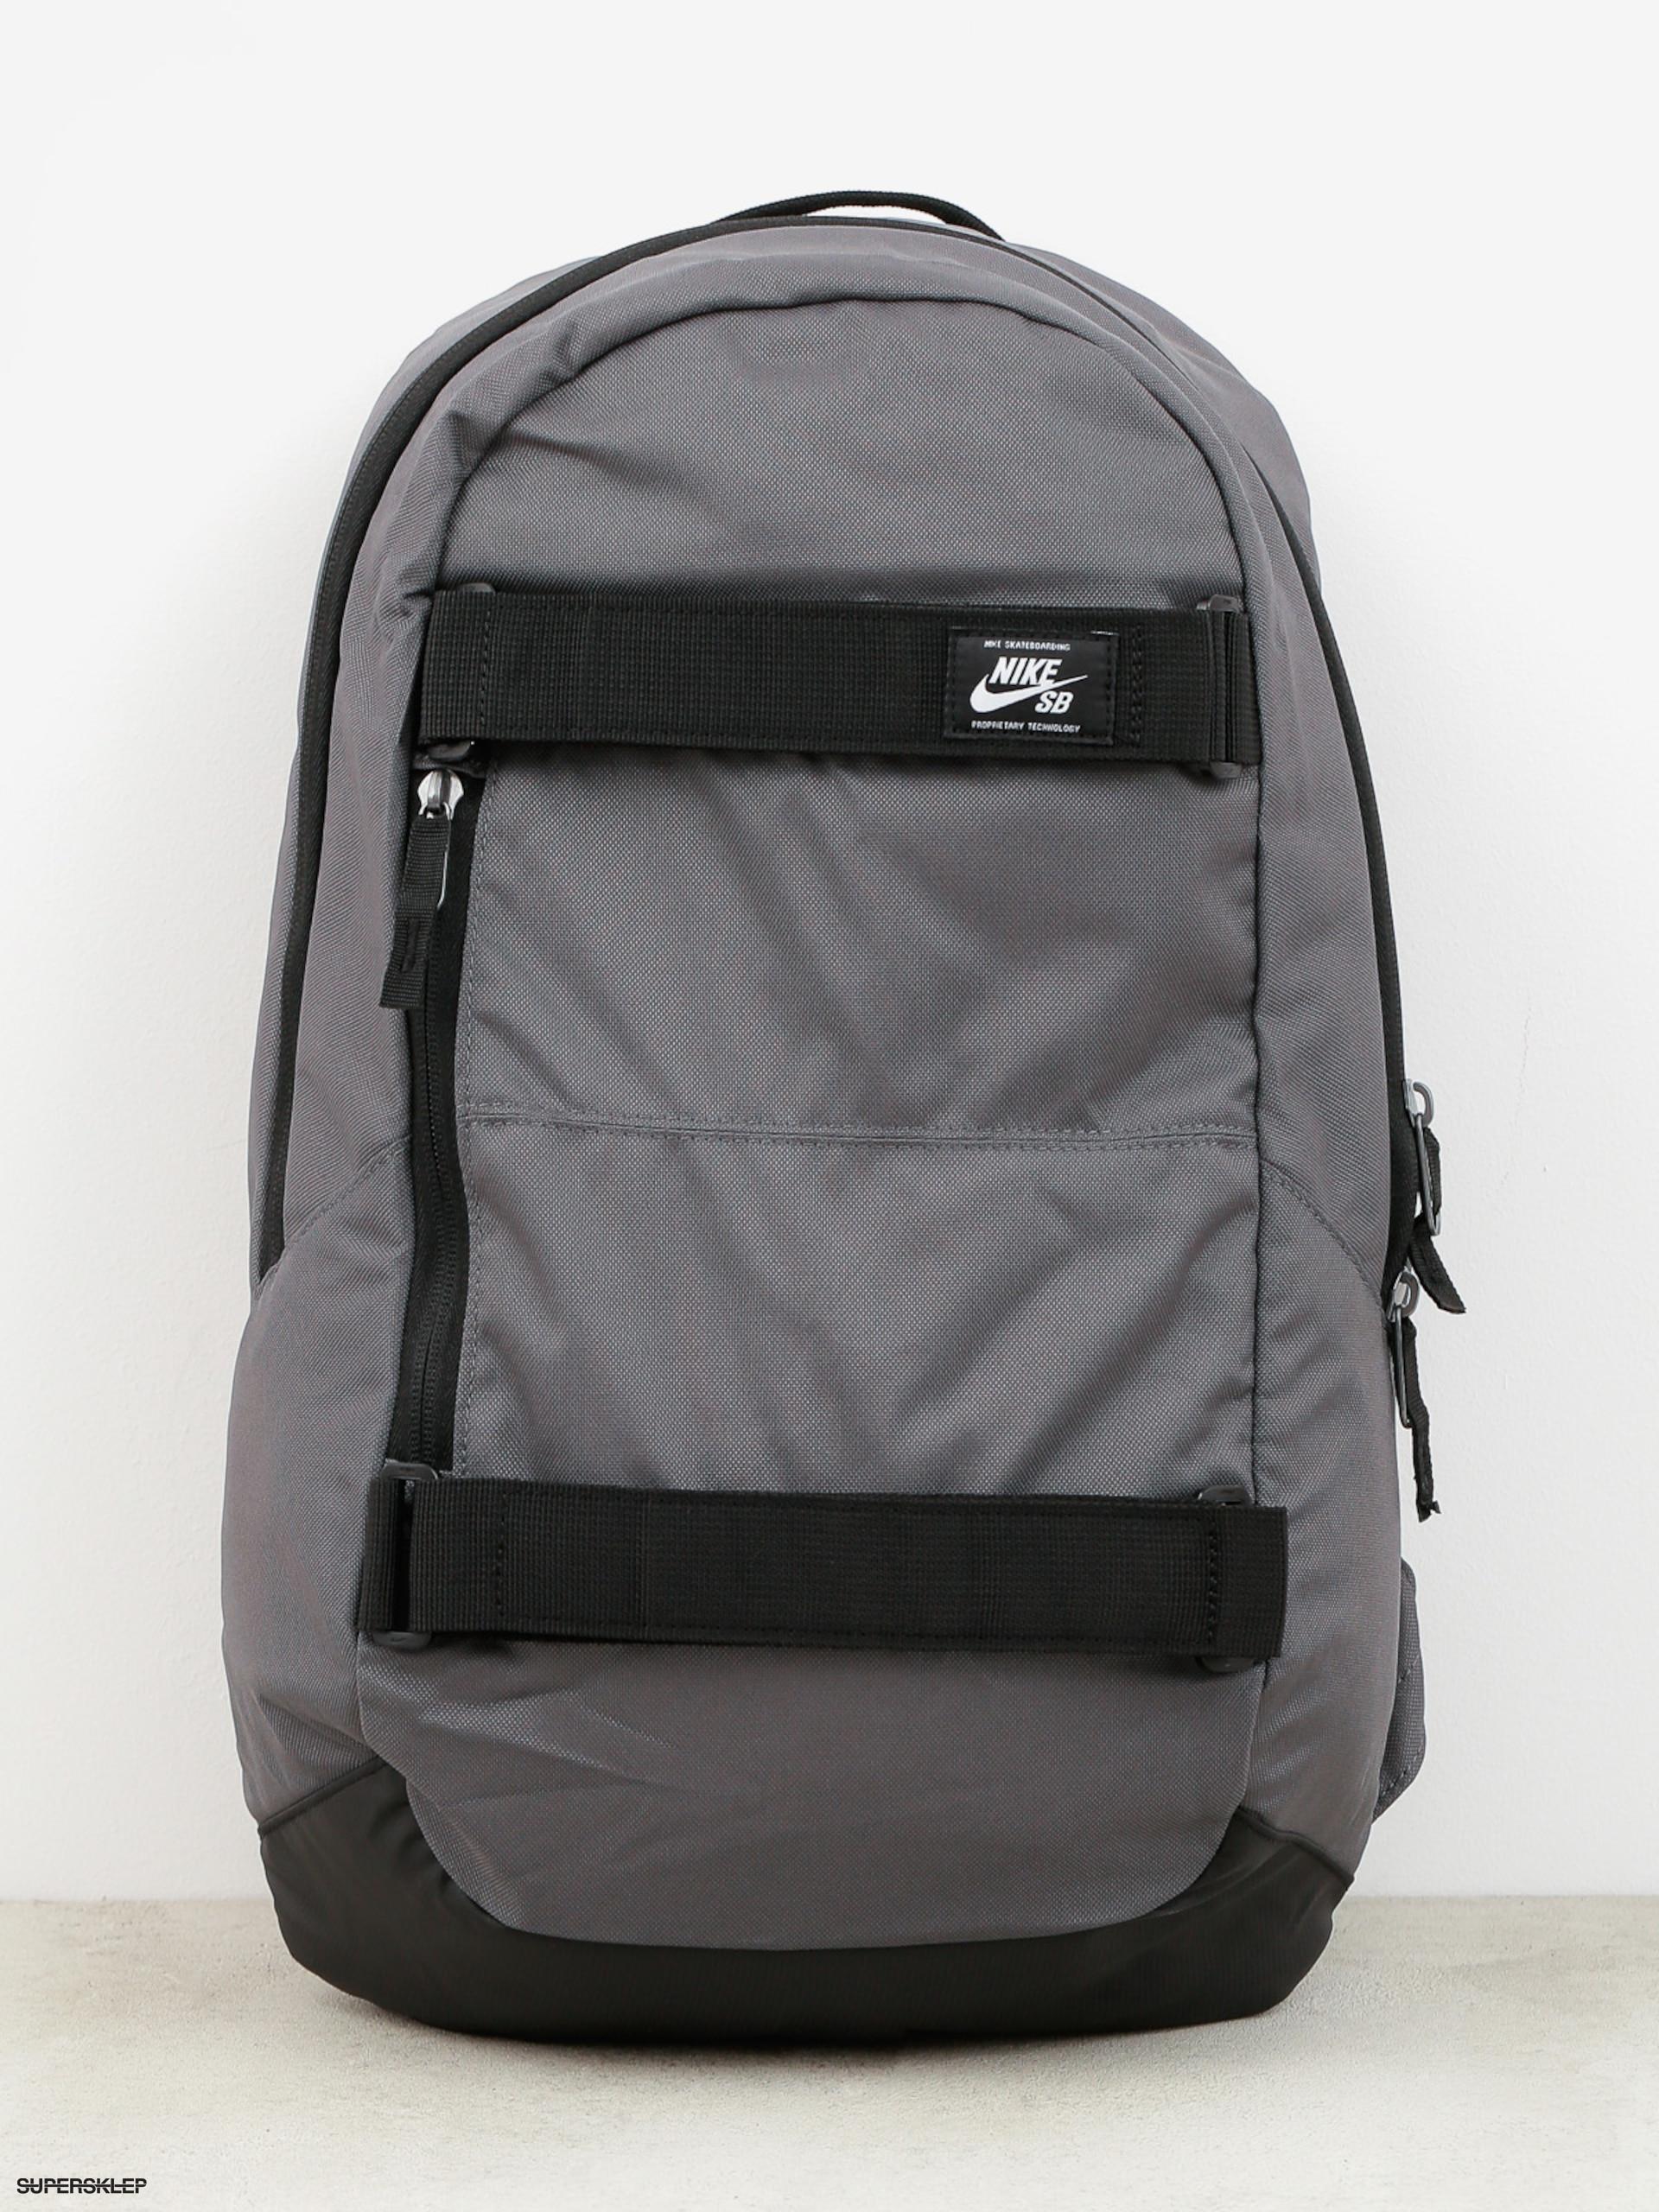 d3ed28a428eab Plecak Nike SB Sb Courthouse (dark grey/black/white)